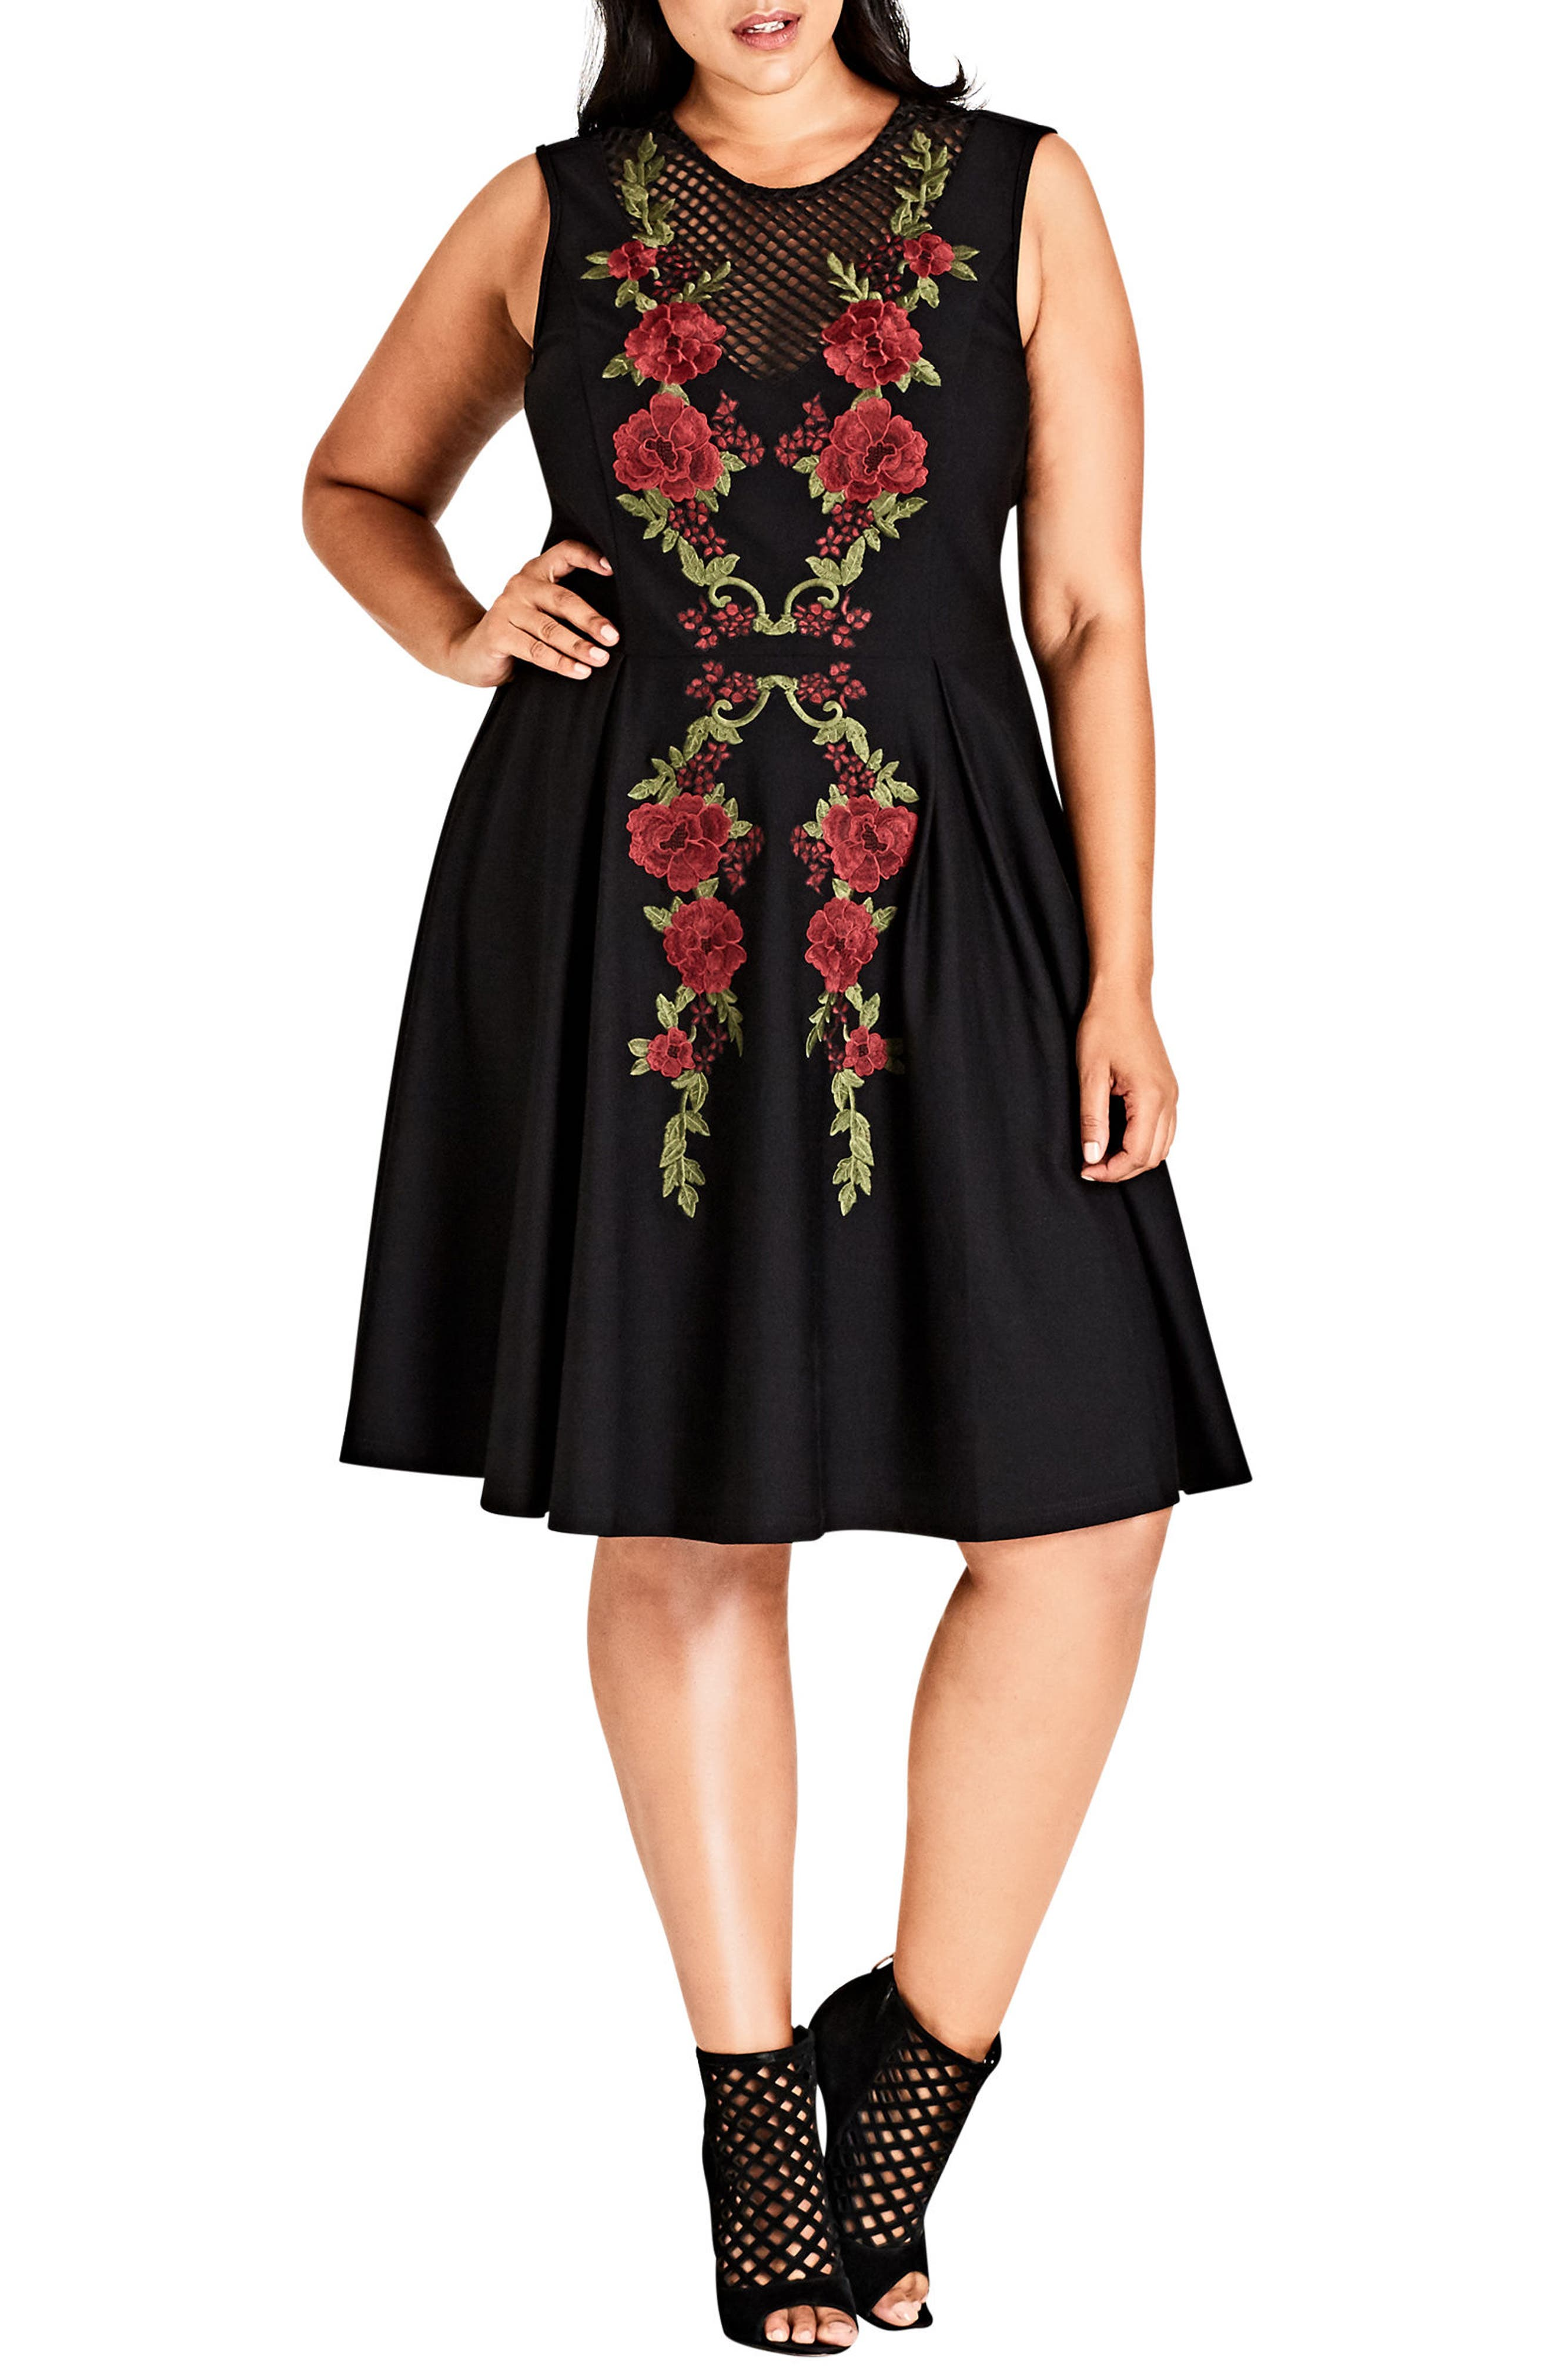 Rose Adore Fit & Flare Dress,                             Main thumbnail 1, color,                             BLACK